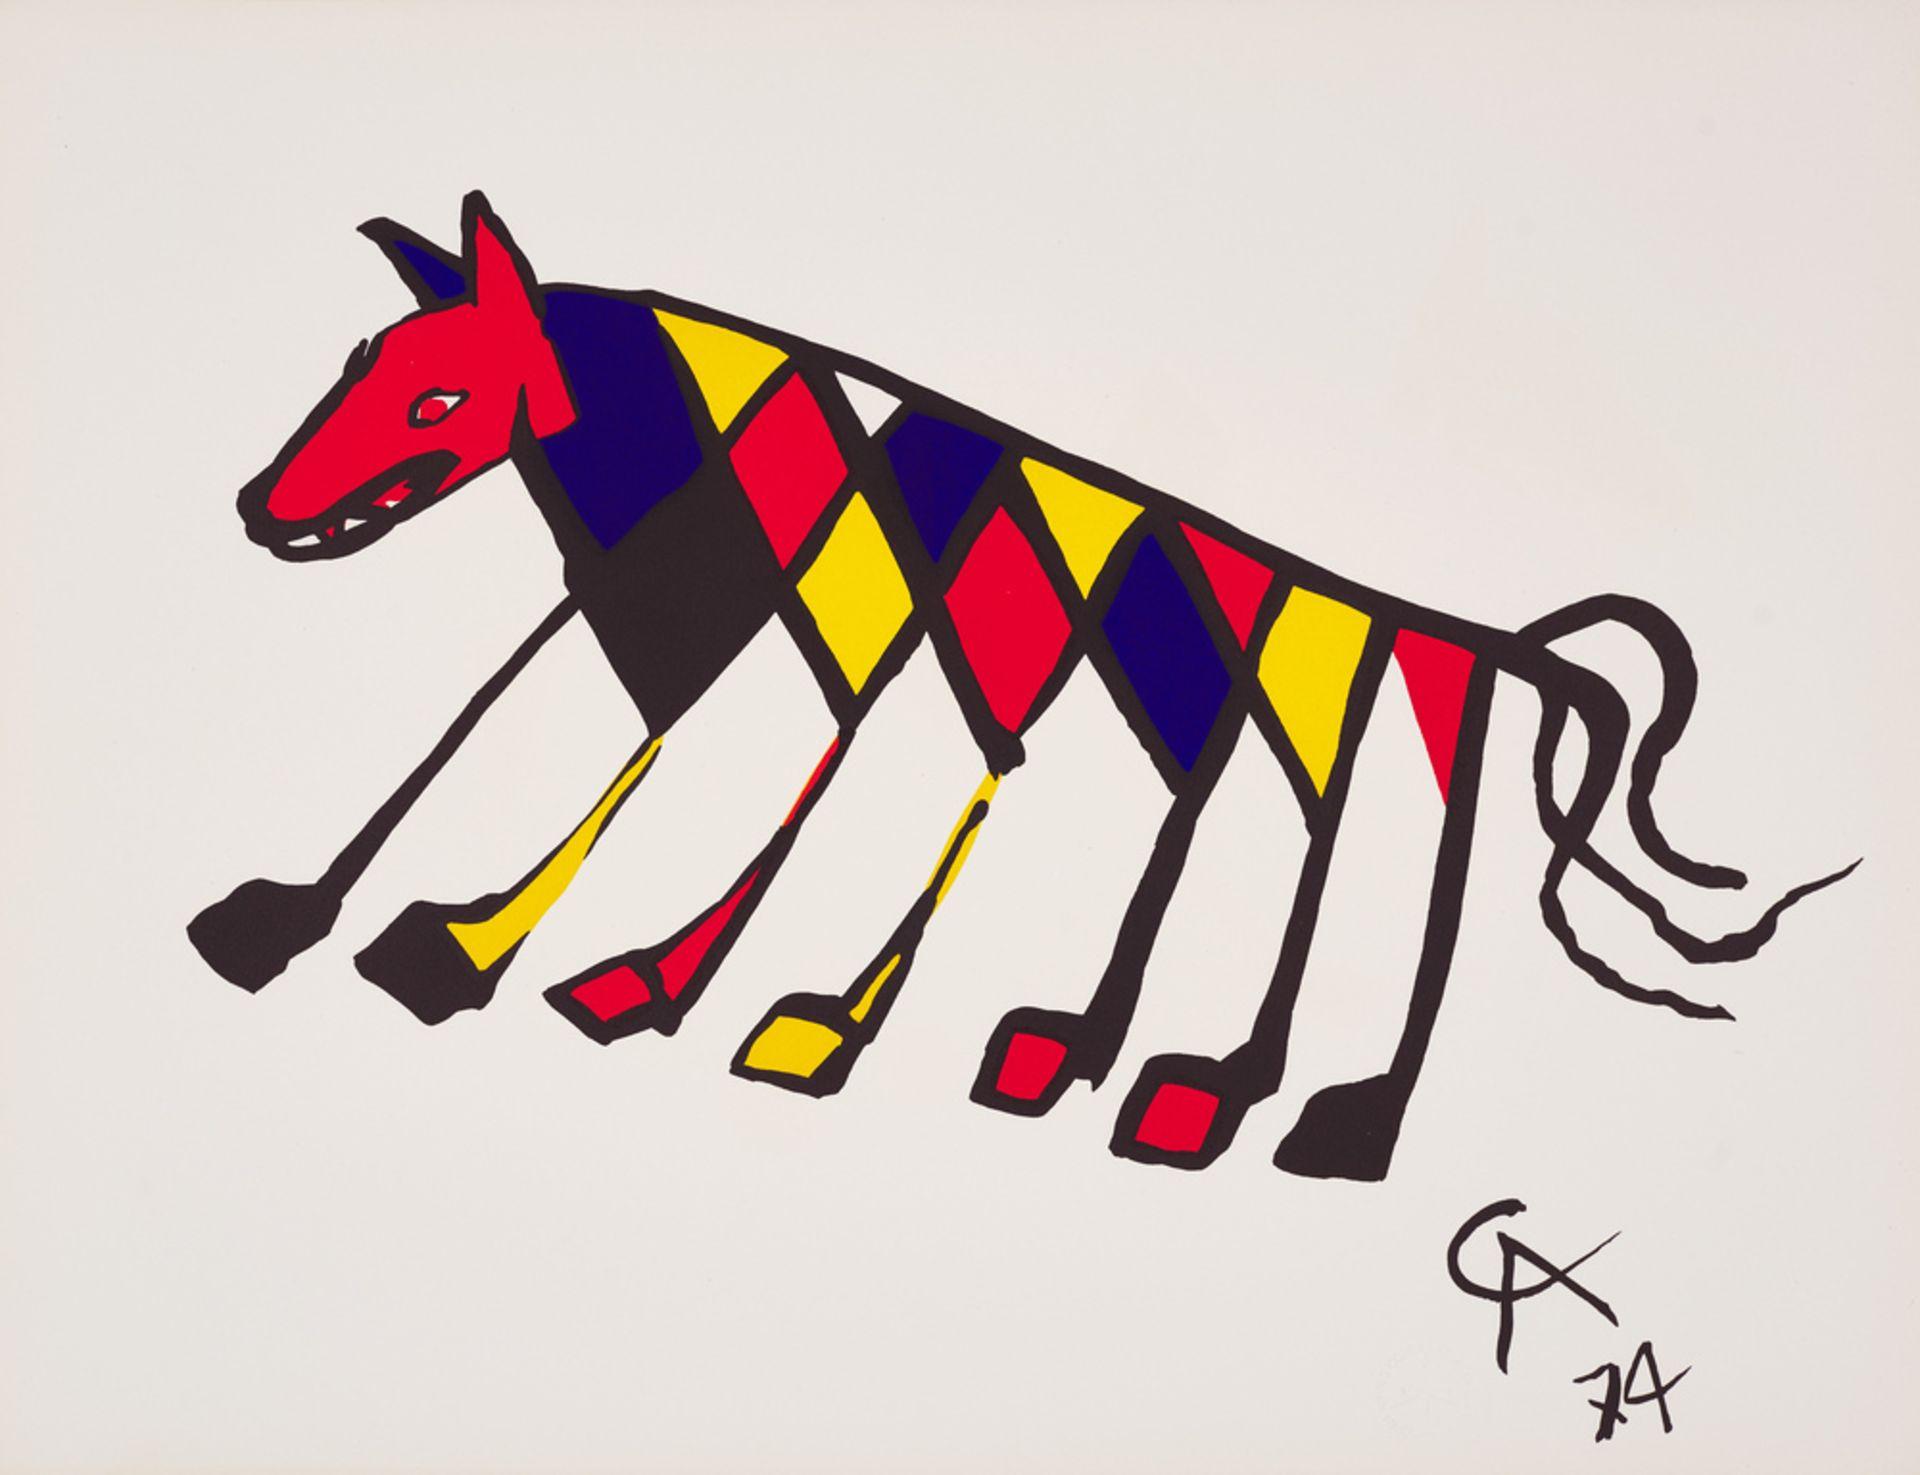 Alexander Calder ,  Lawnton 1898 – 1976 Nowy Jork , Beastie, z cyklu: Braniff Airlines Flying Colors